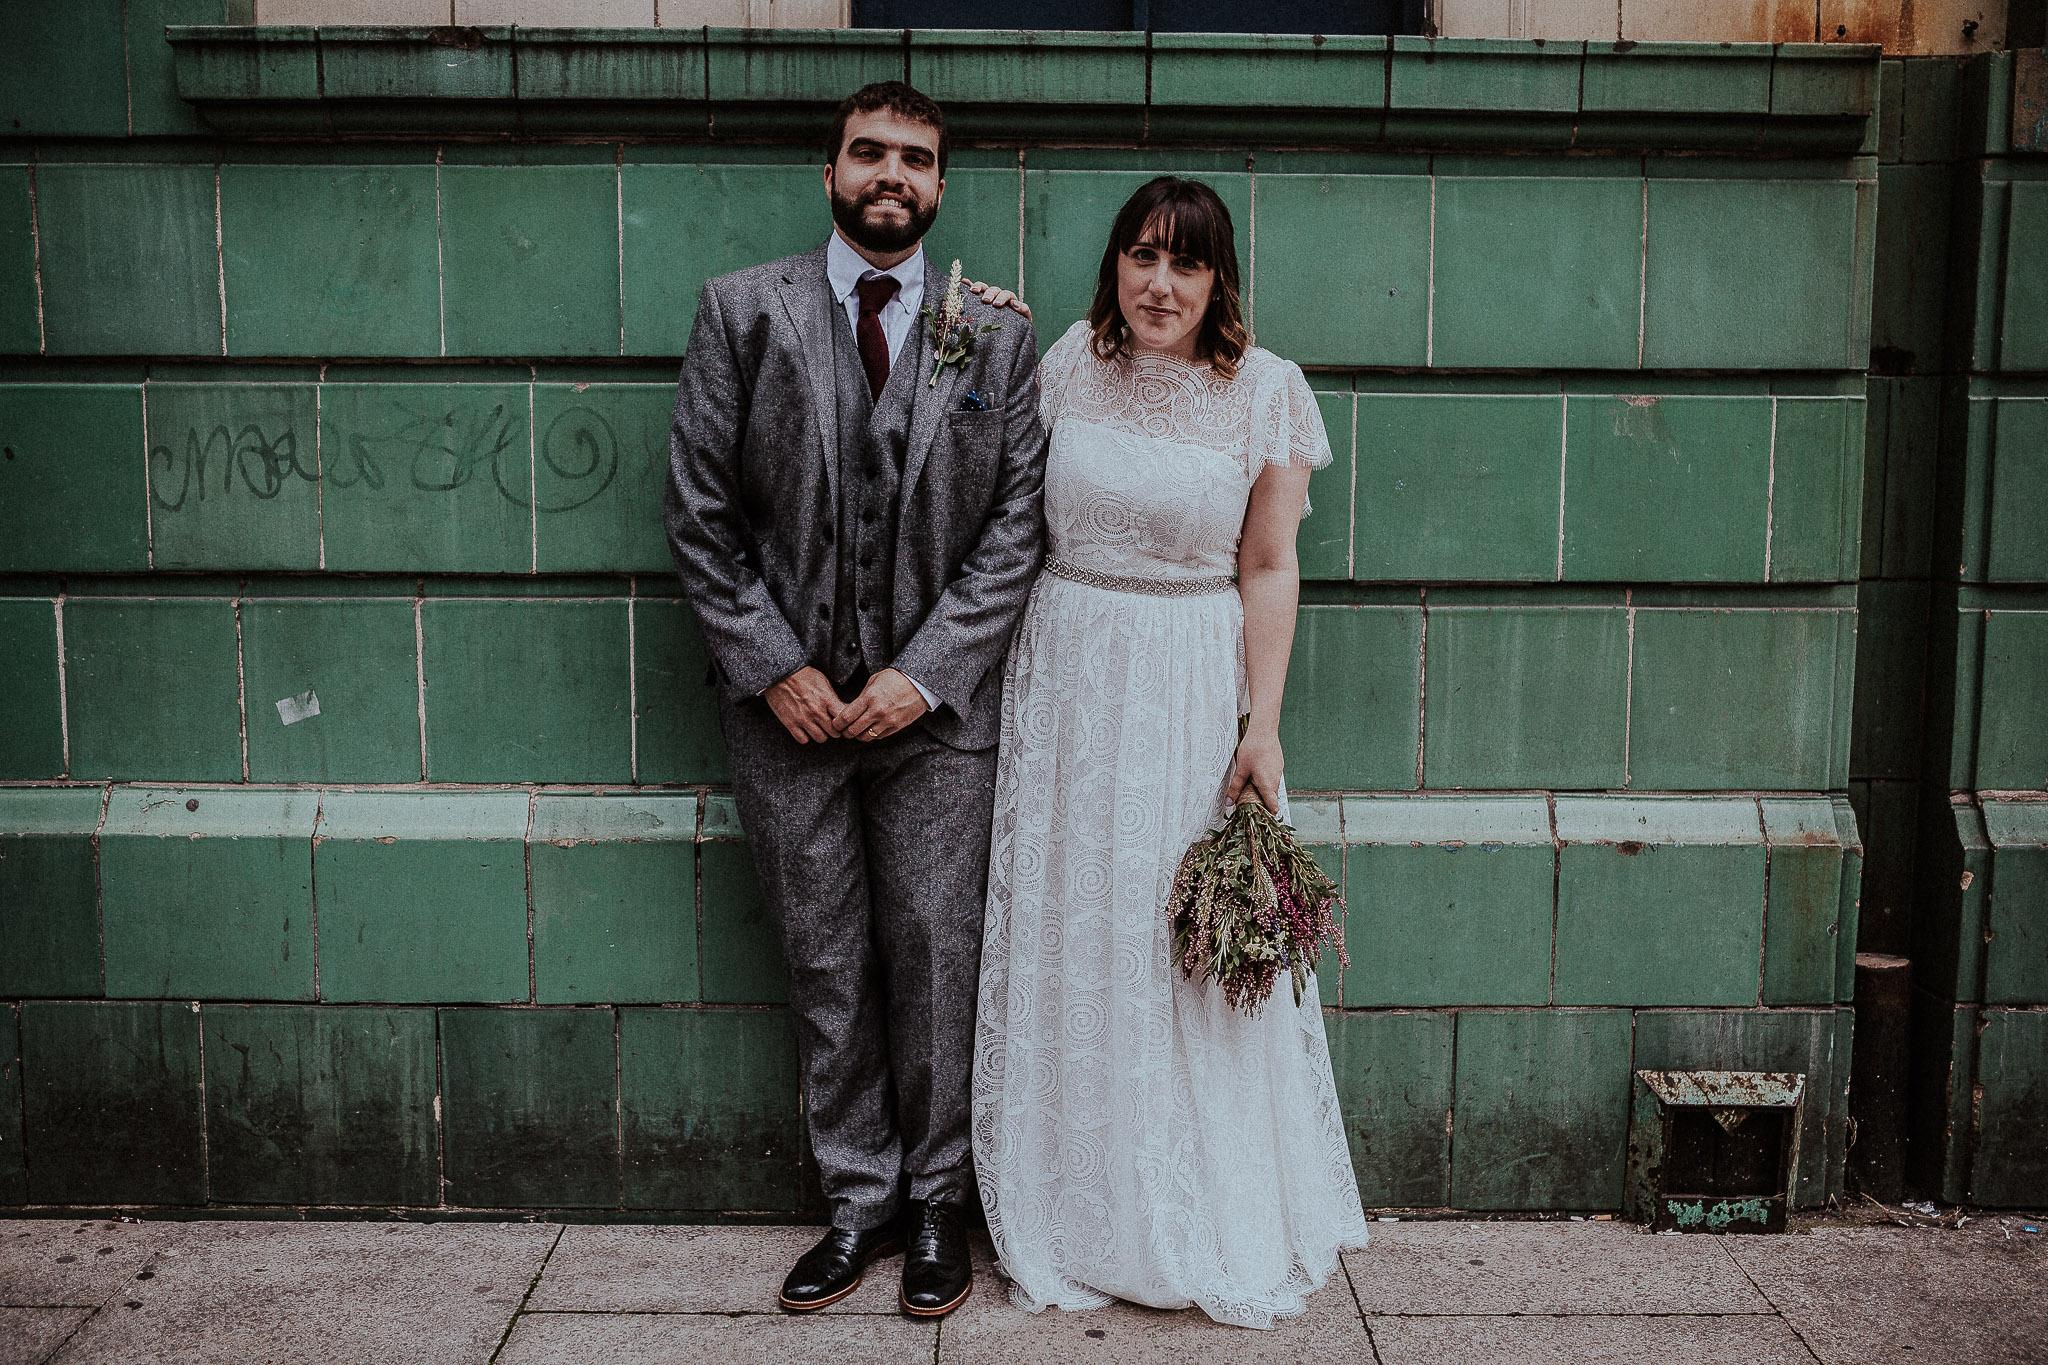 Manchester_Alternative_Wedding_Photographer-66.jpg